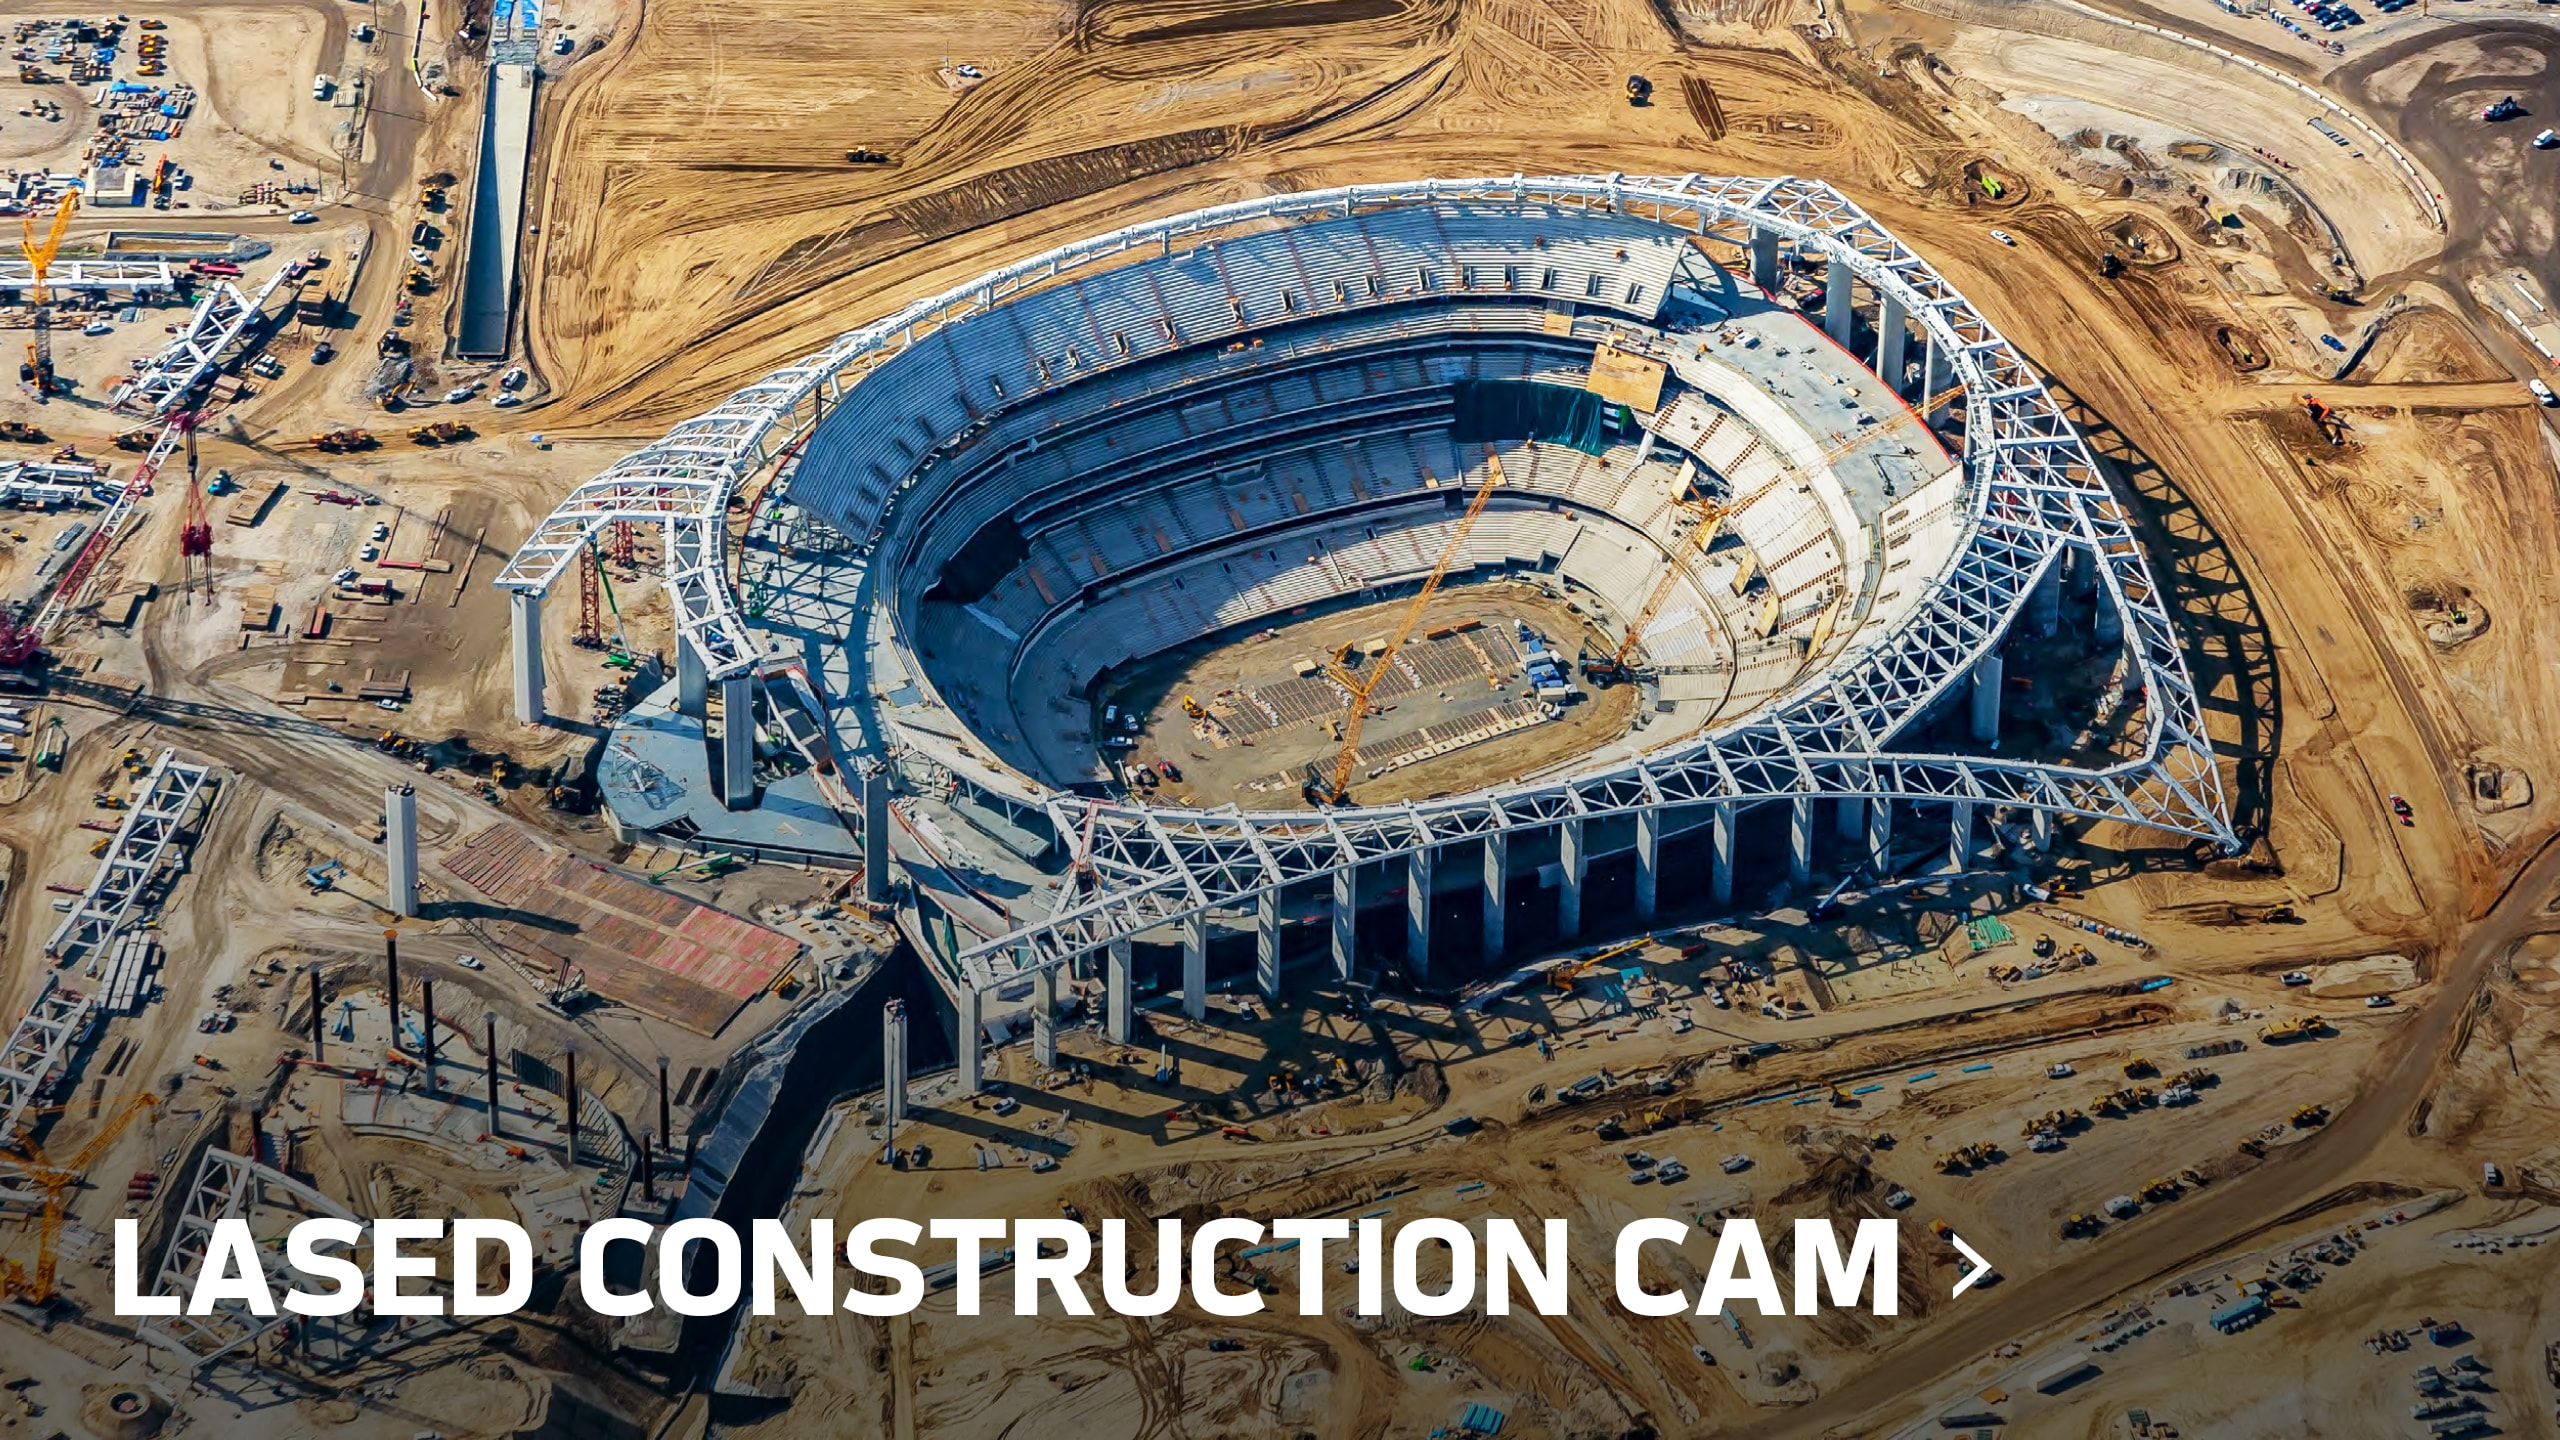 LASED Construction Cam